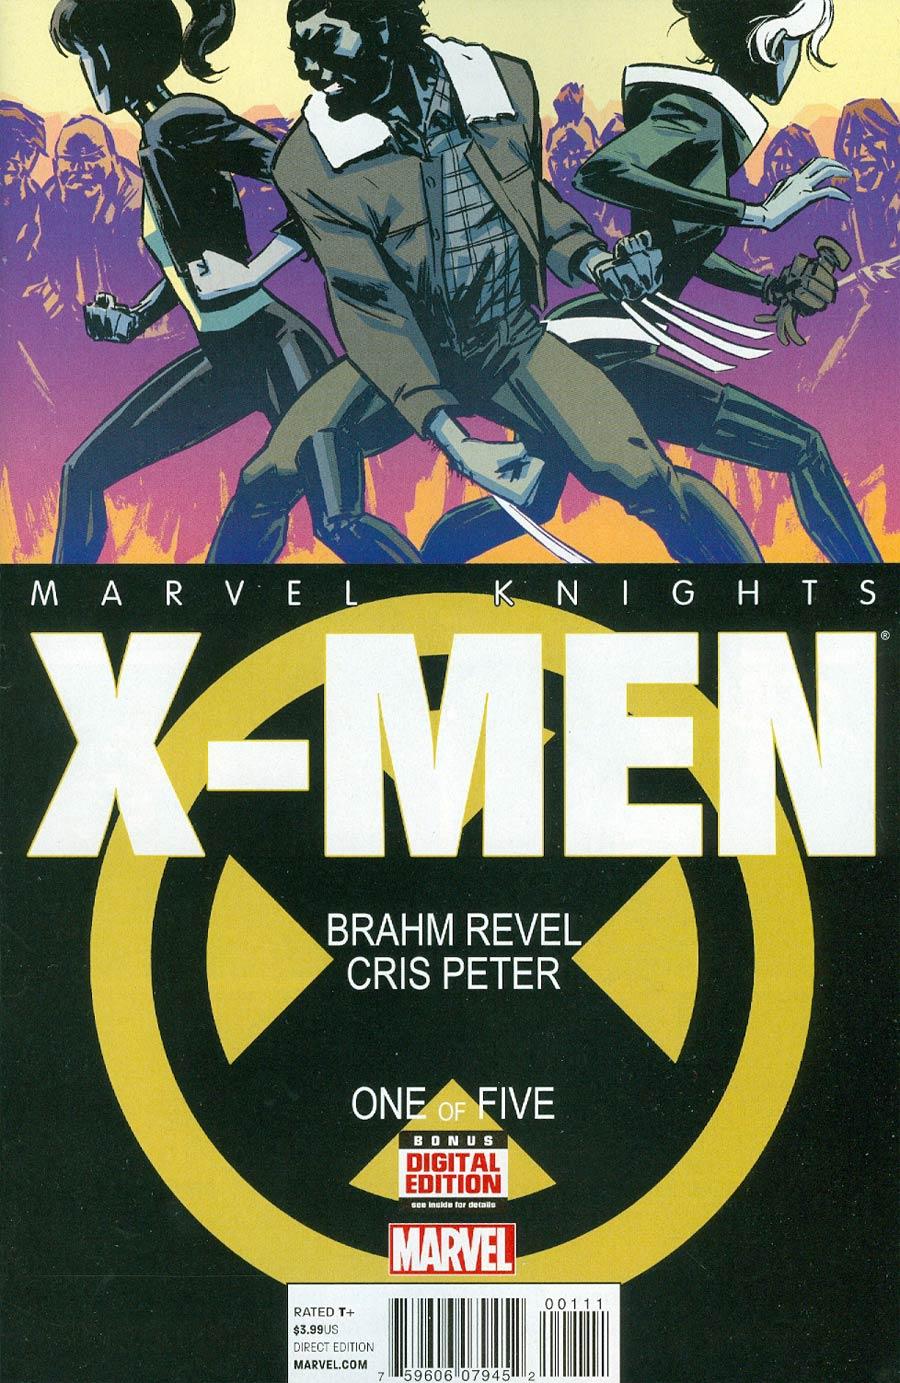 Marvel Knights X-Men #1 Cover A Regular Brahm Revel Cover